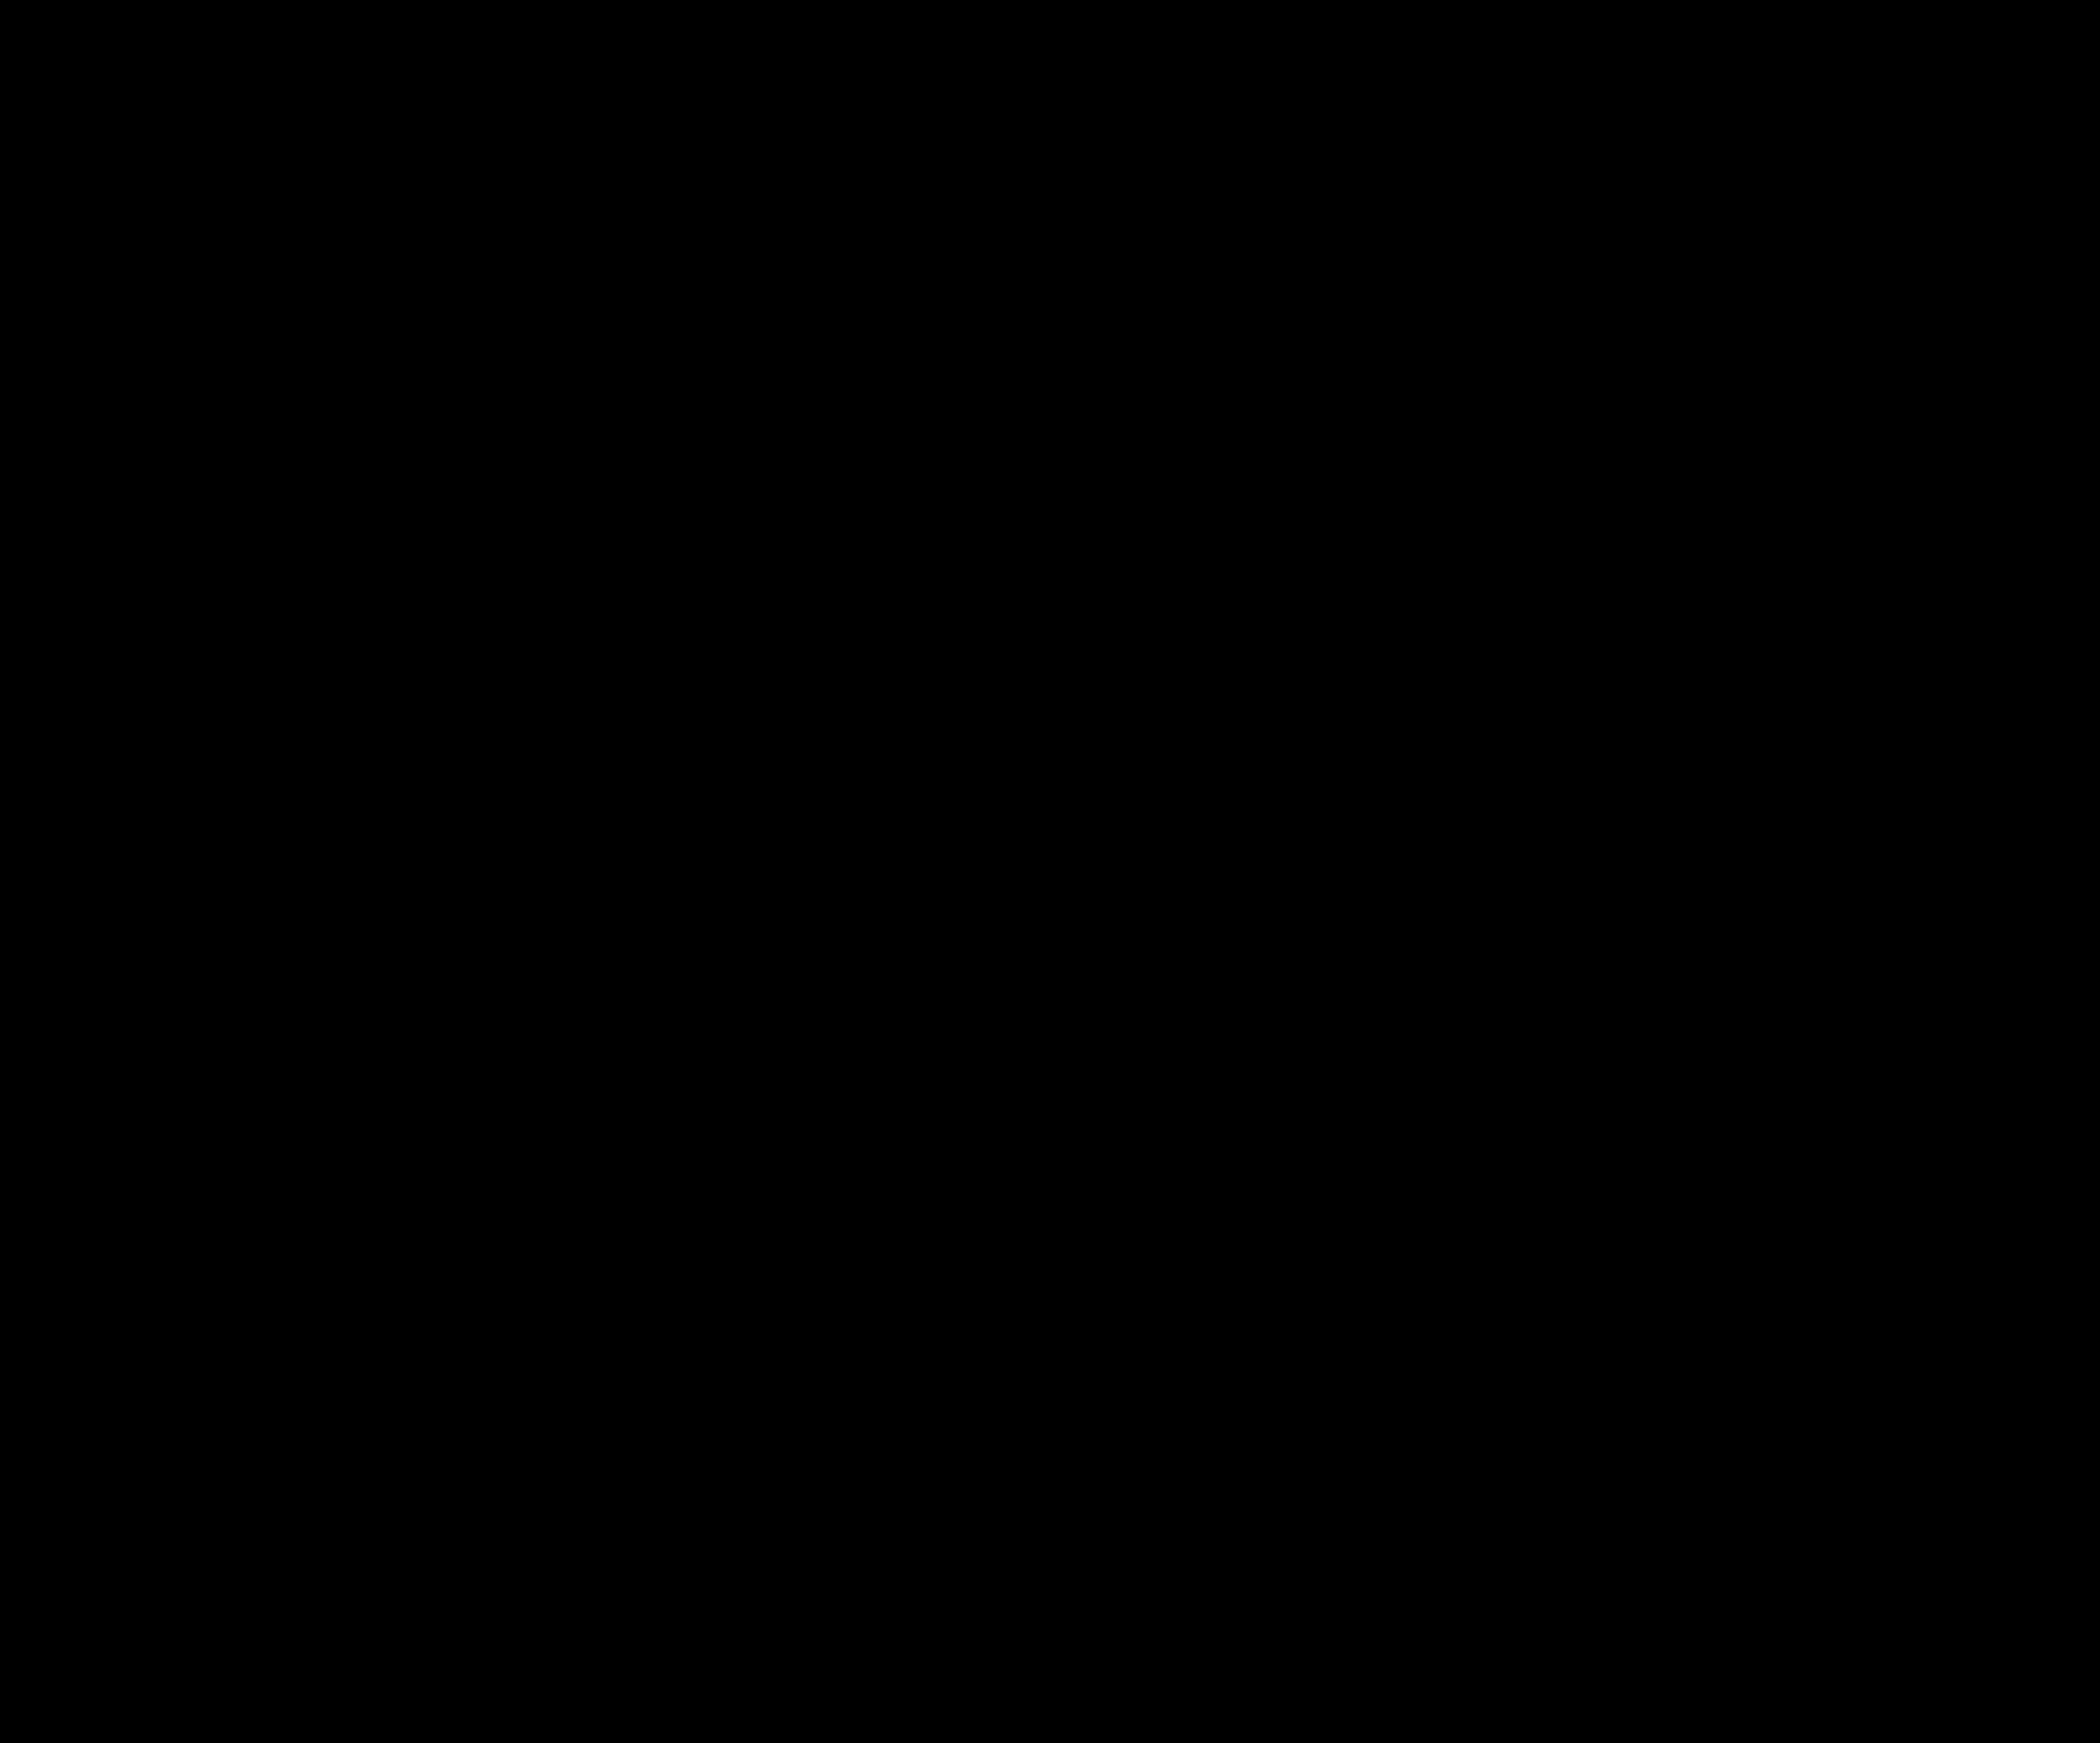 _2BP0569_A